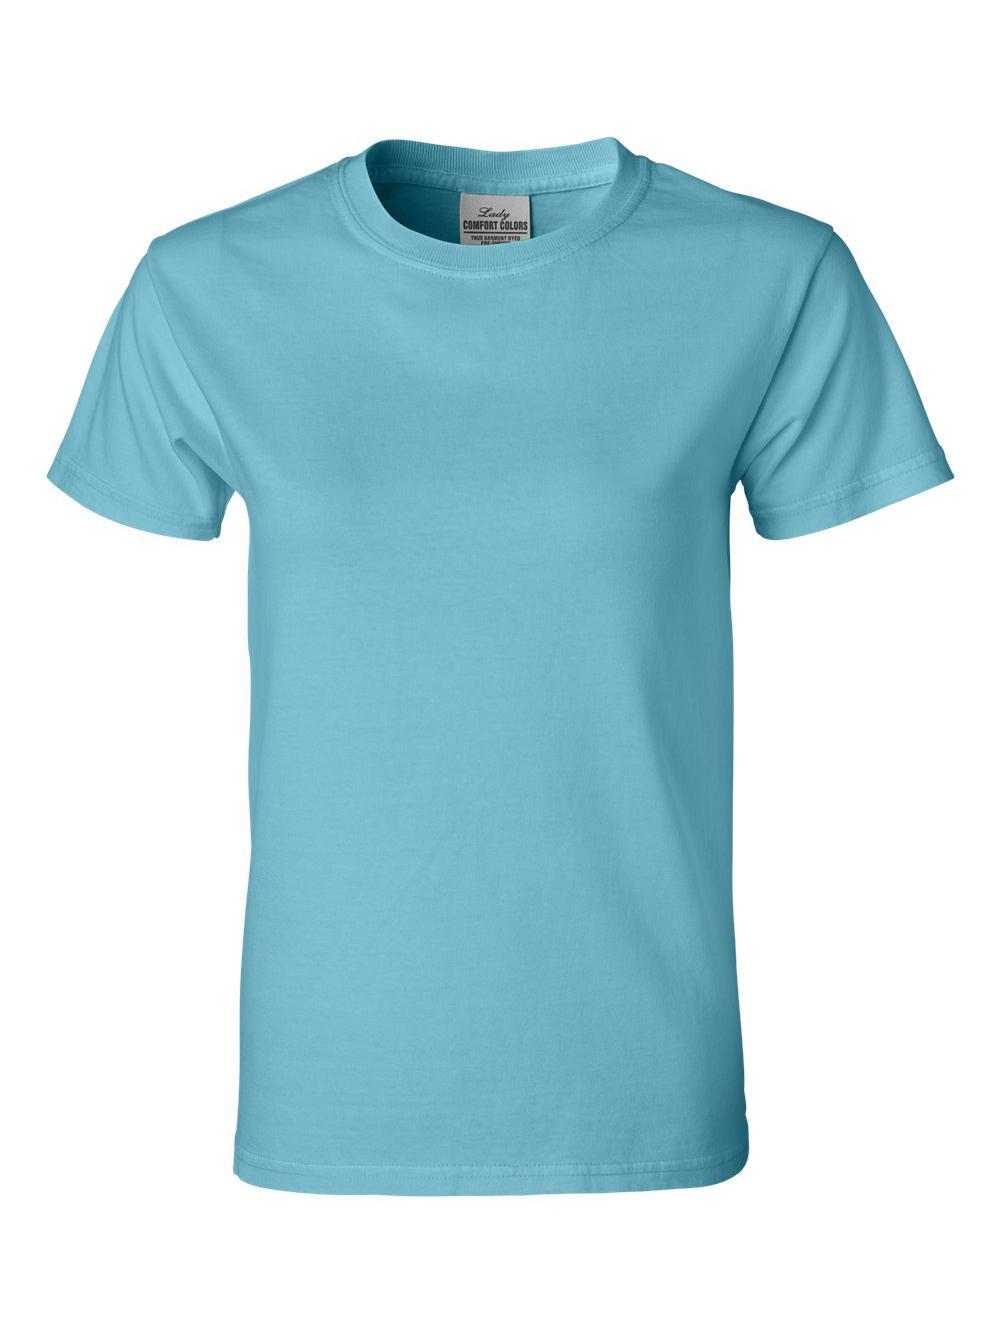 Comfort-Colors-Pigment-Dyed-Ringspun-Women-039-s-Short-Sleeve-T-Shirt-3333 thumbnail 22